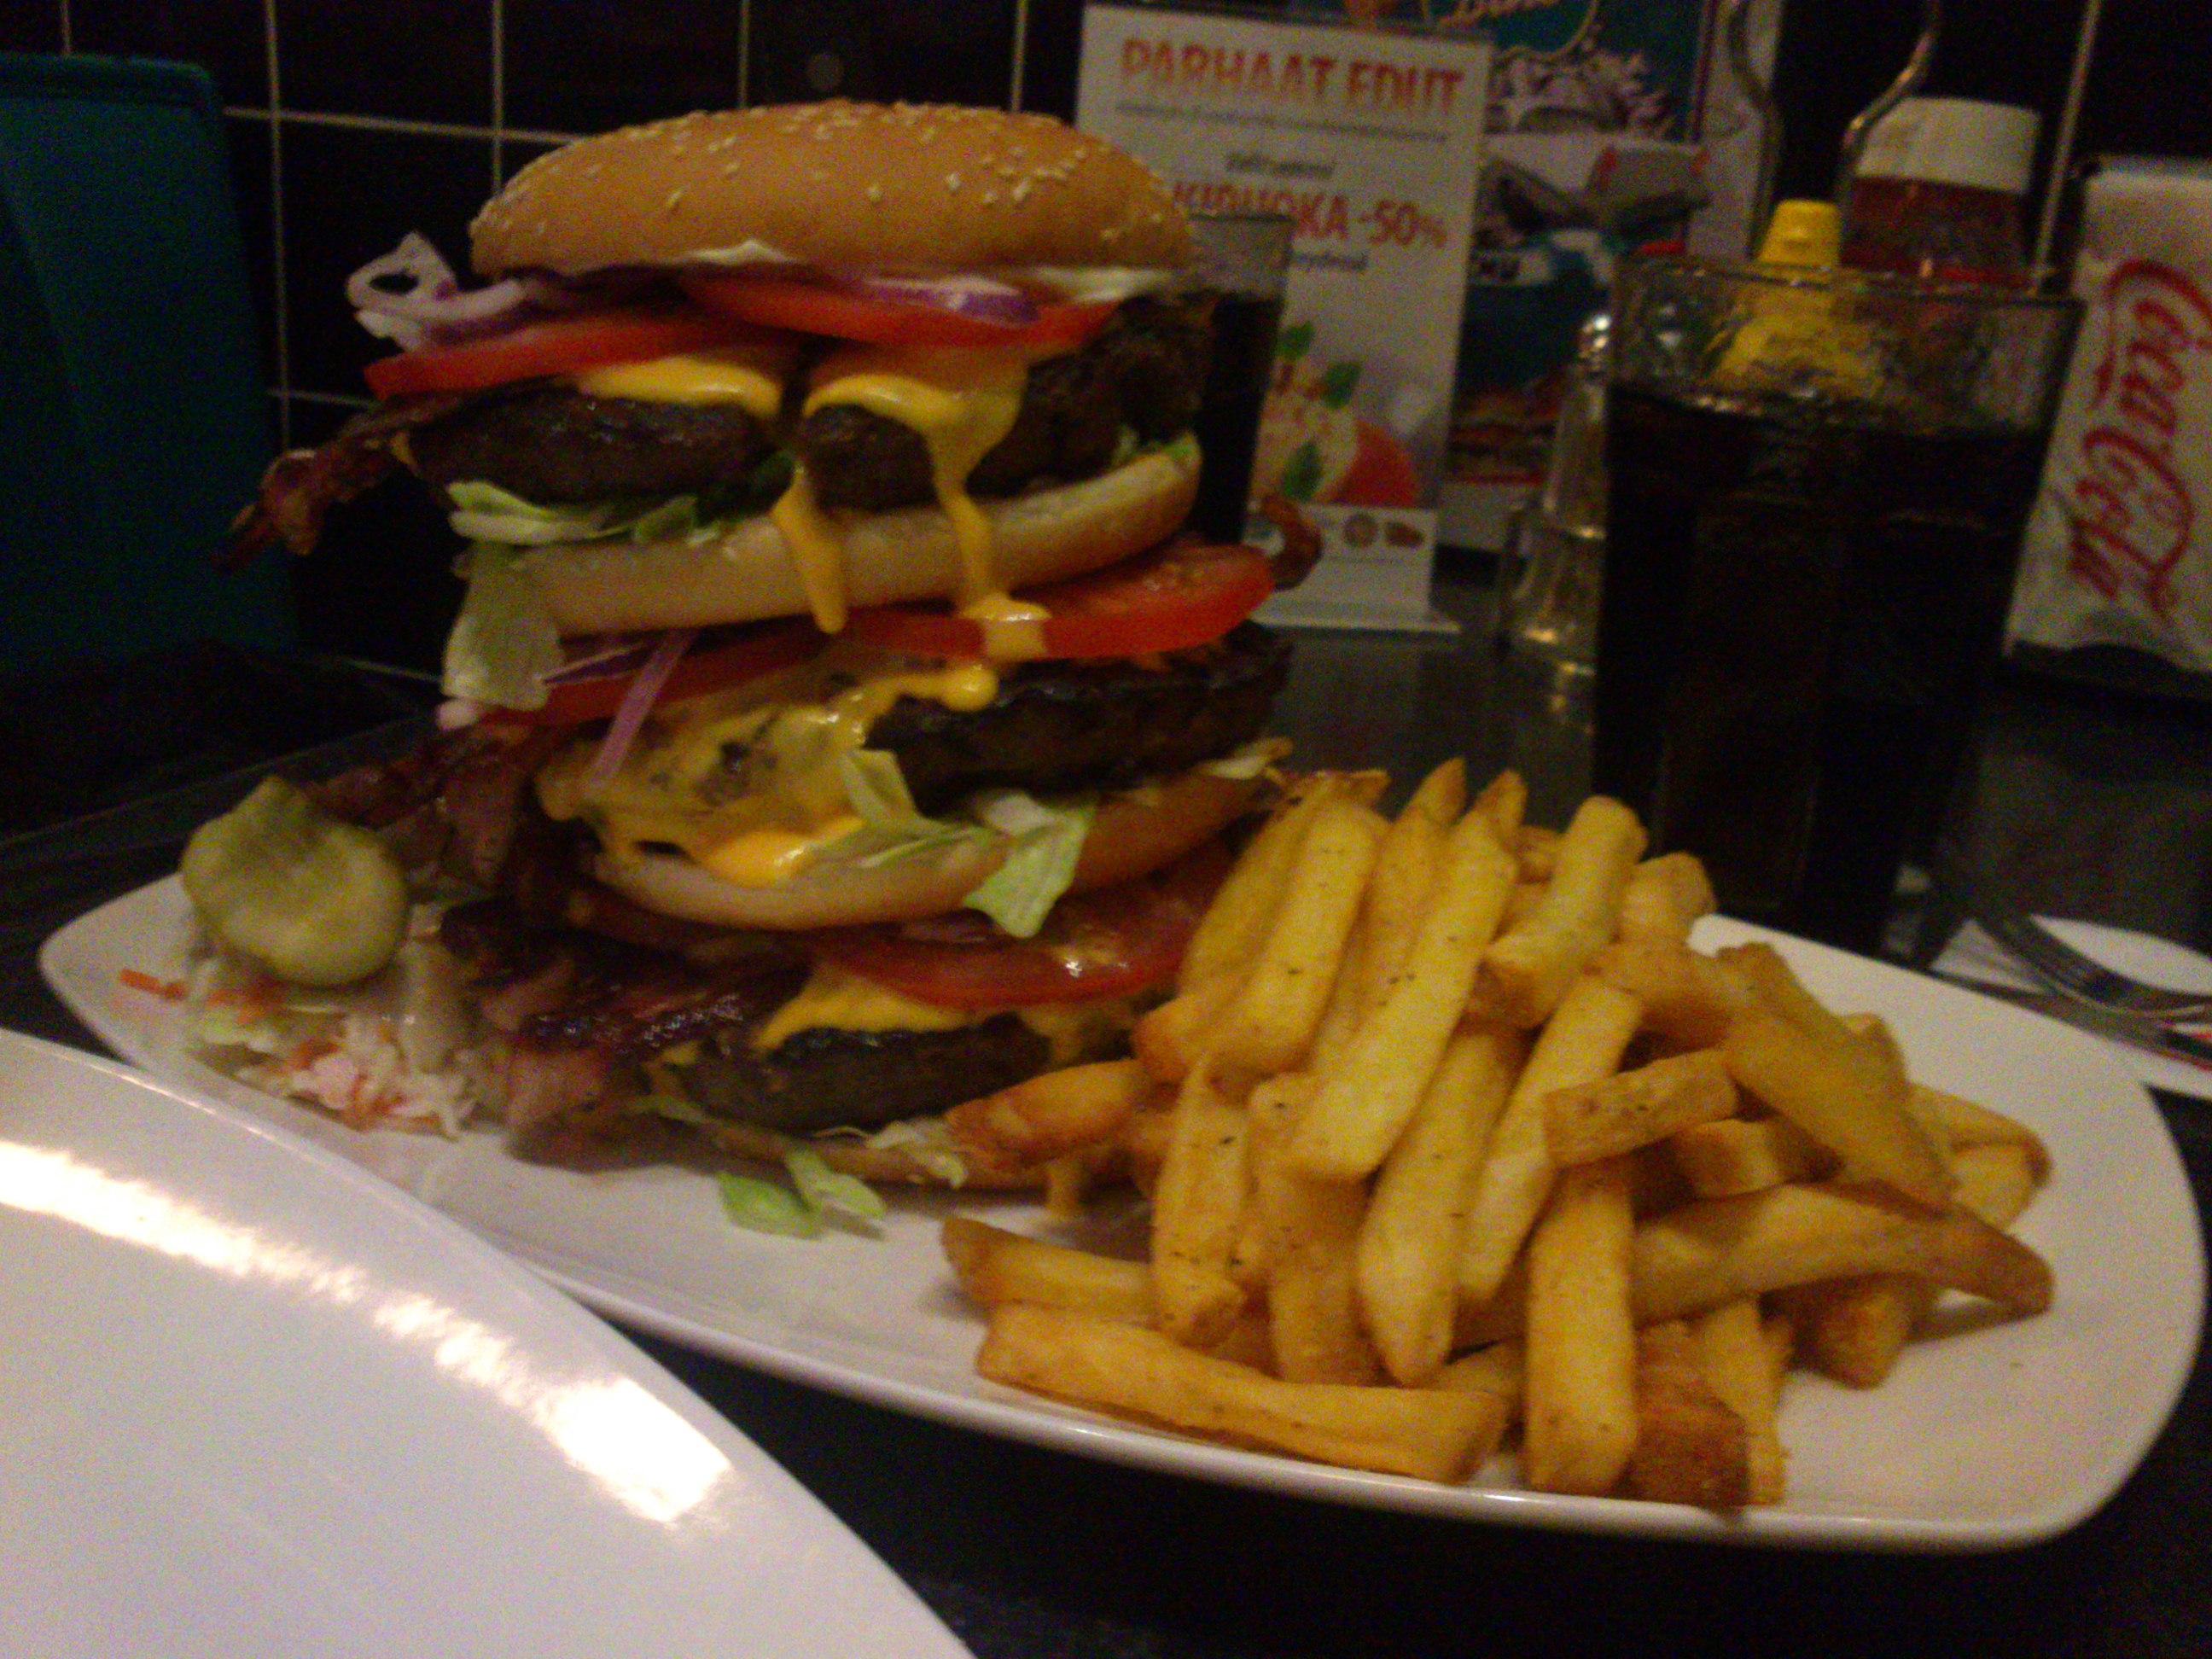 American Diner, Tampere: Big tower